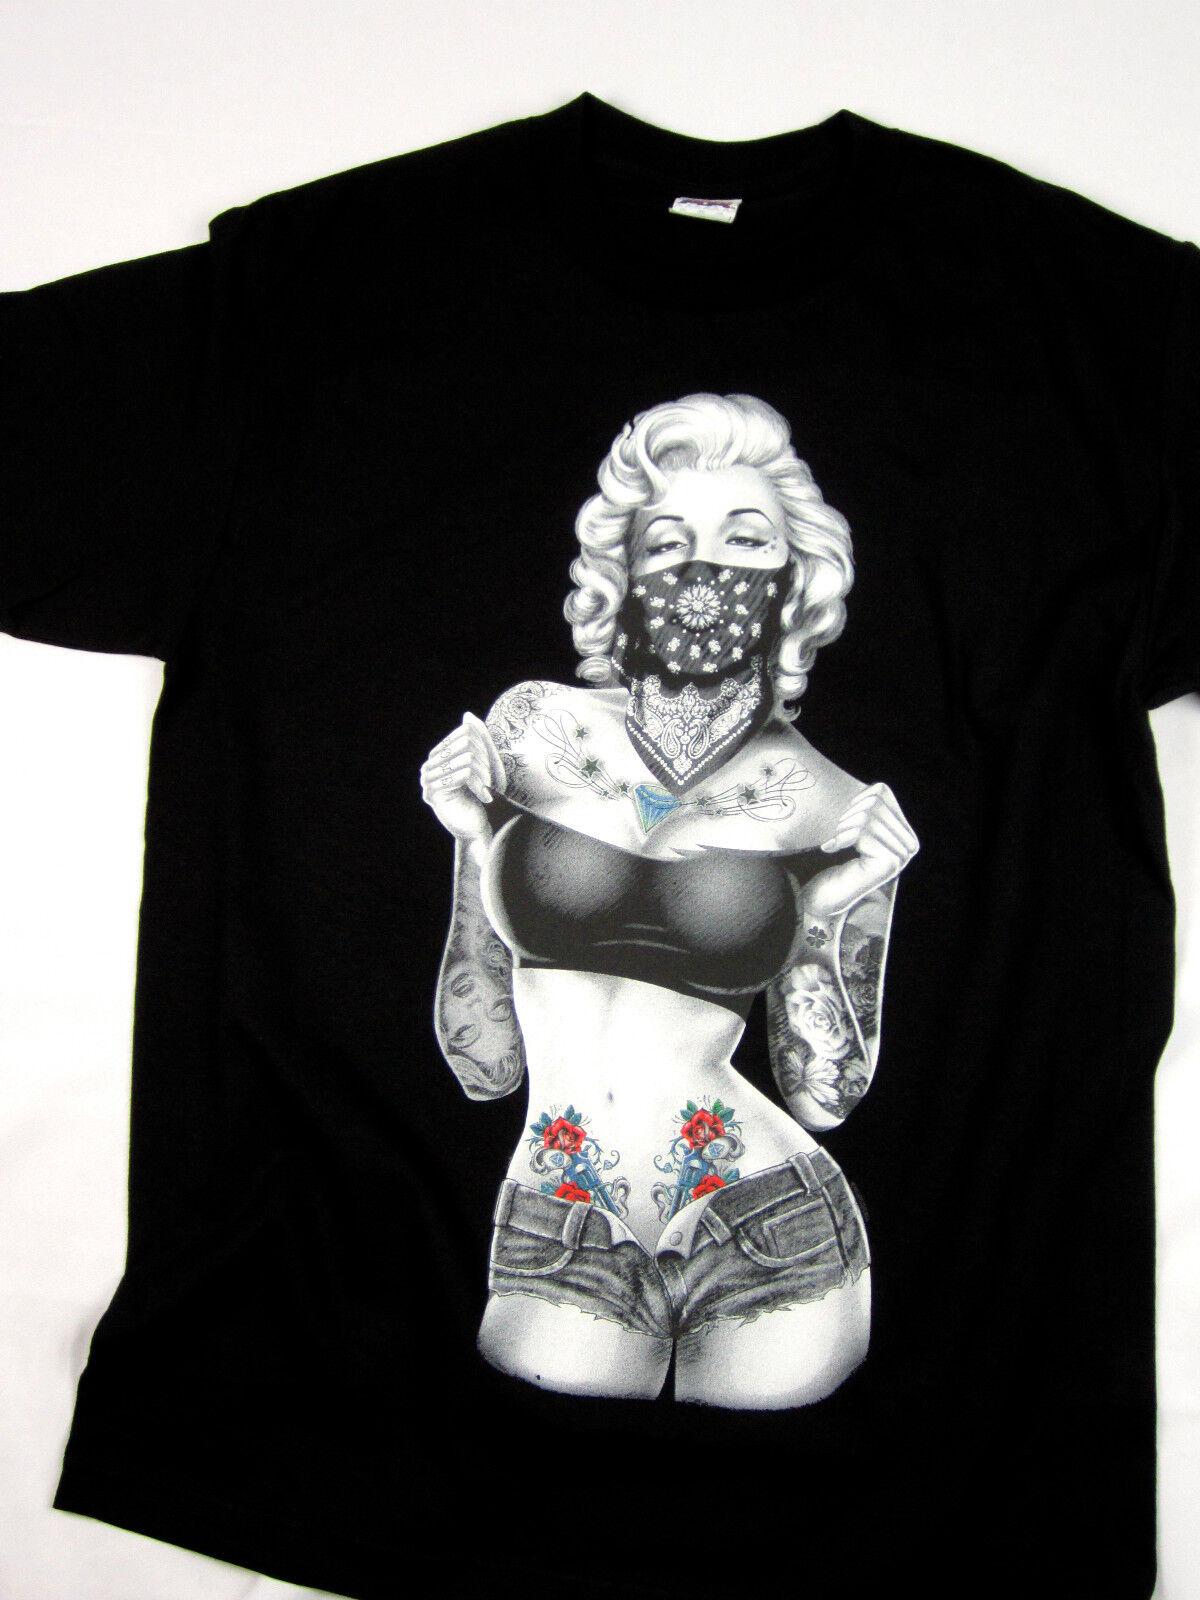 Marilyn Monroe Tattoo Gangster Men/'s Tank Top Brand New Quality Shirts